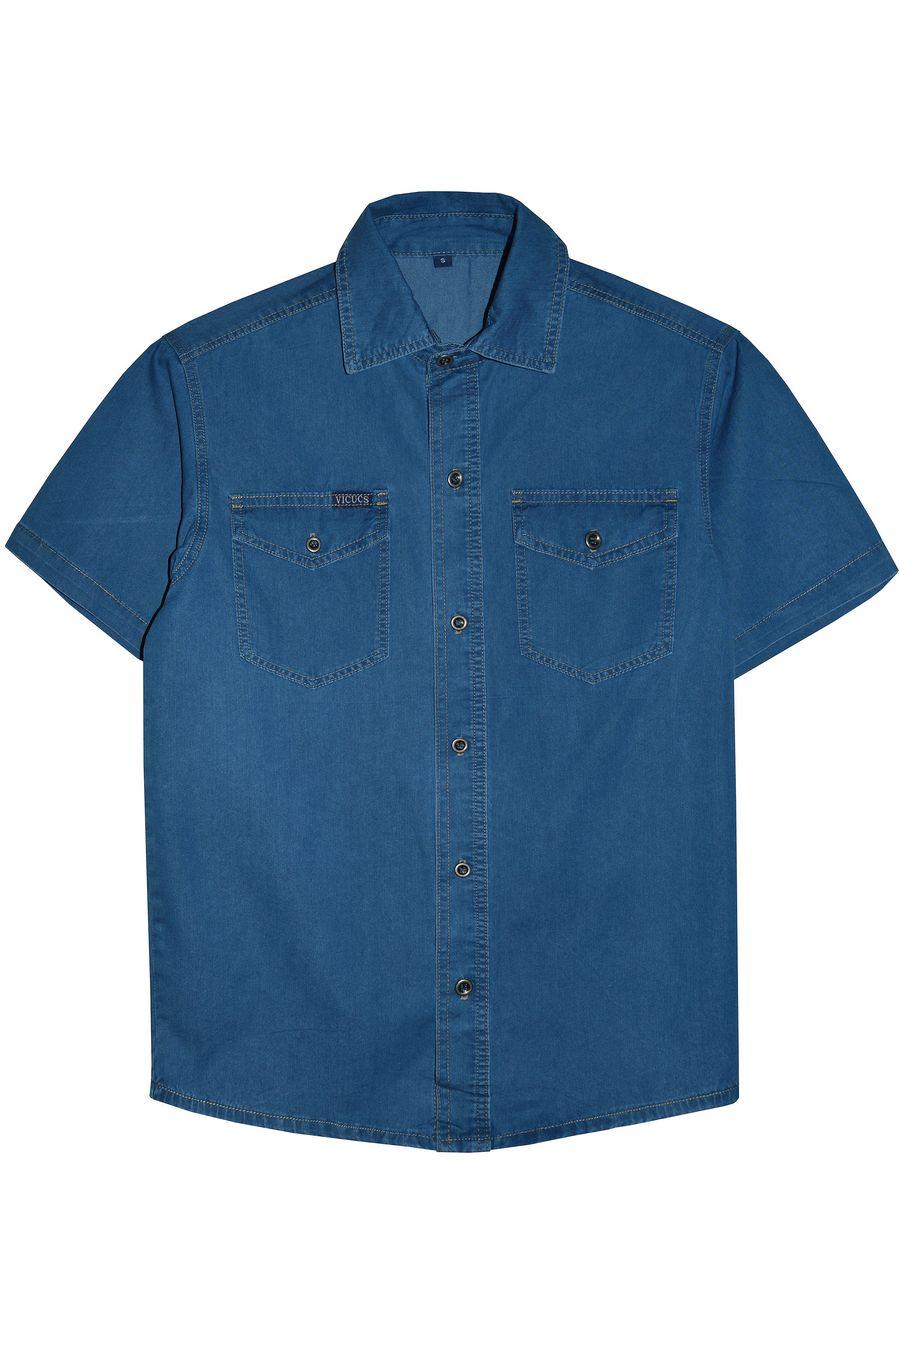 Рубашка мужская Vicucs 728E/CT-321-19 (S-2XL) - фото 1